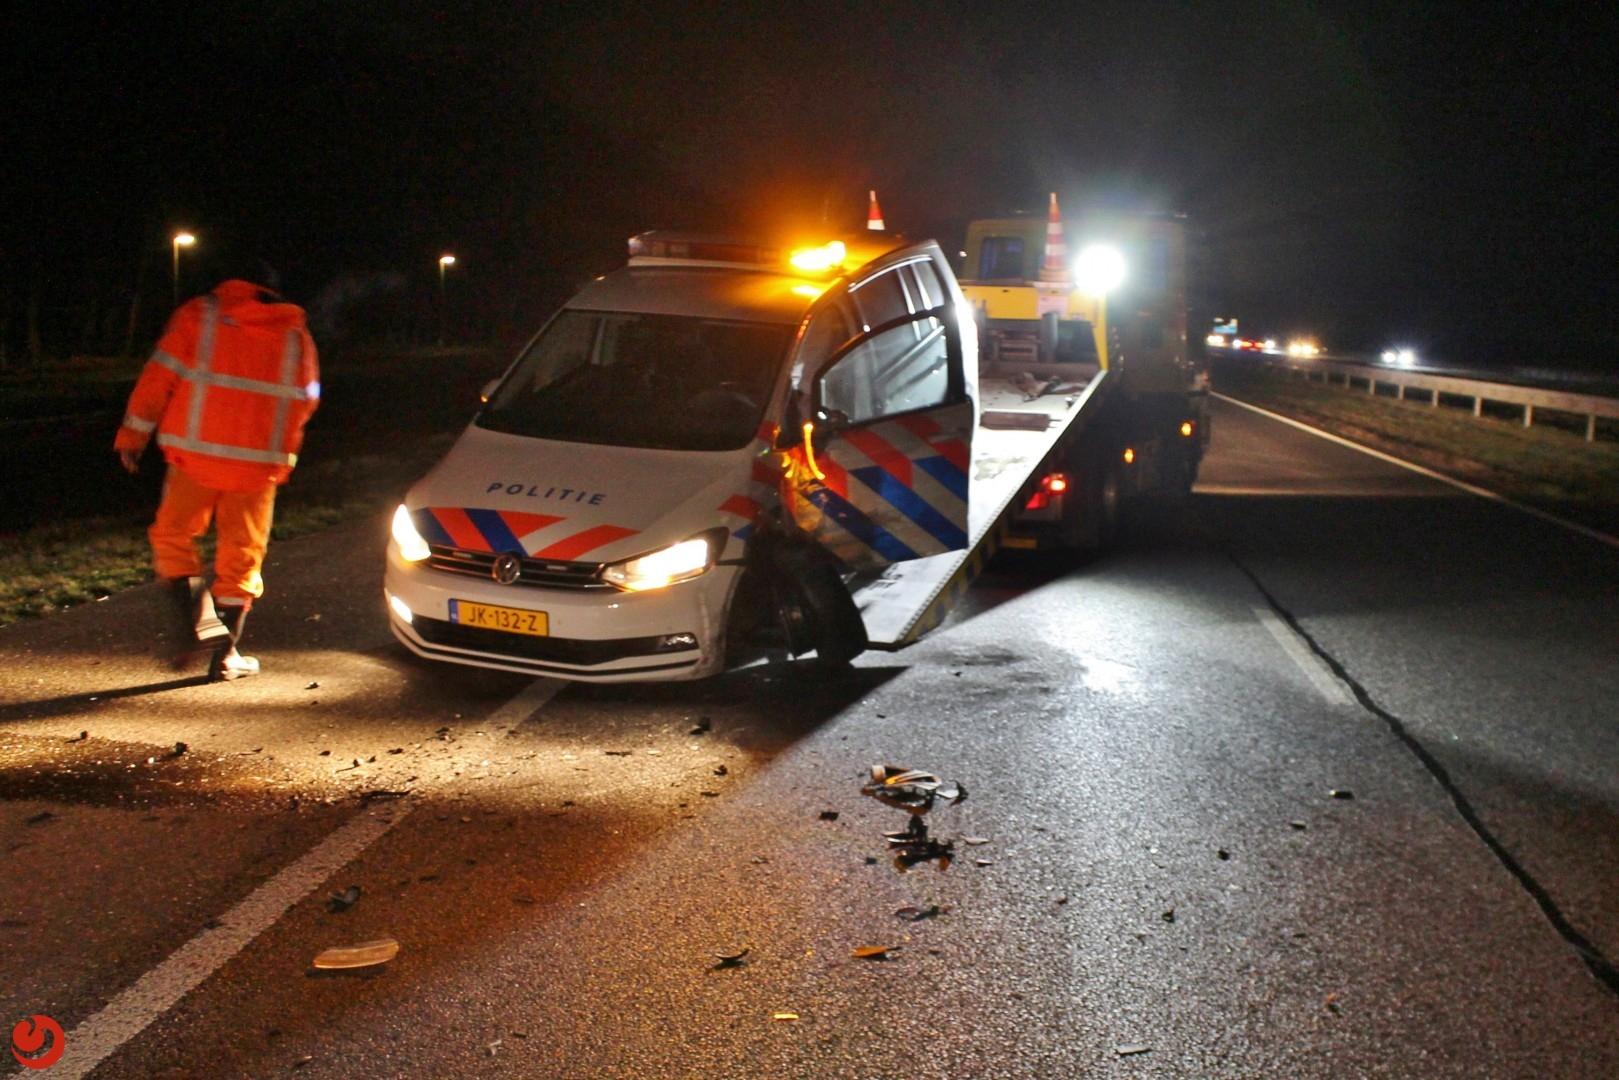 Automobiliste knalt op politiewagen